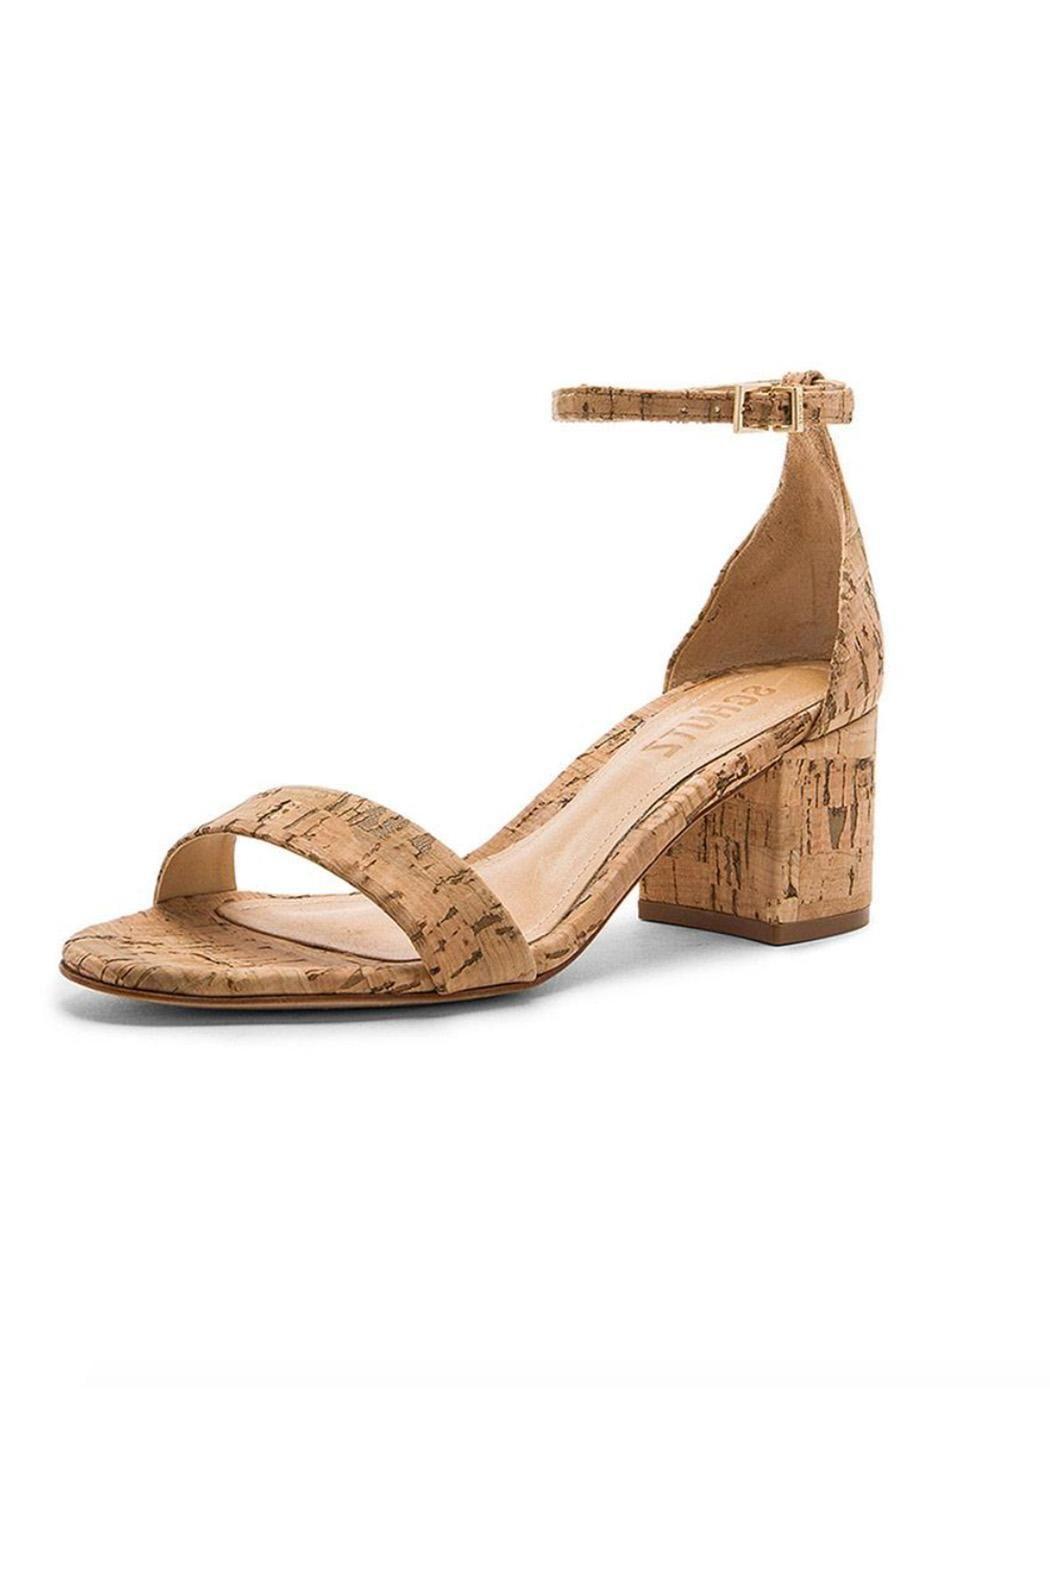 Schutz Chimes Block Heel Sandal PzrNzZRa